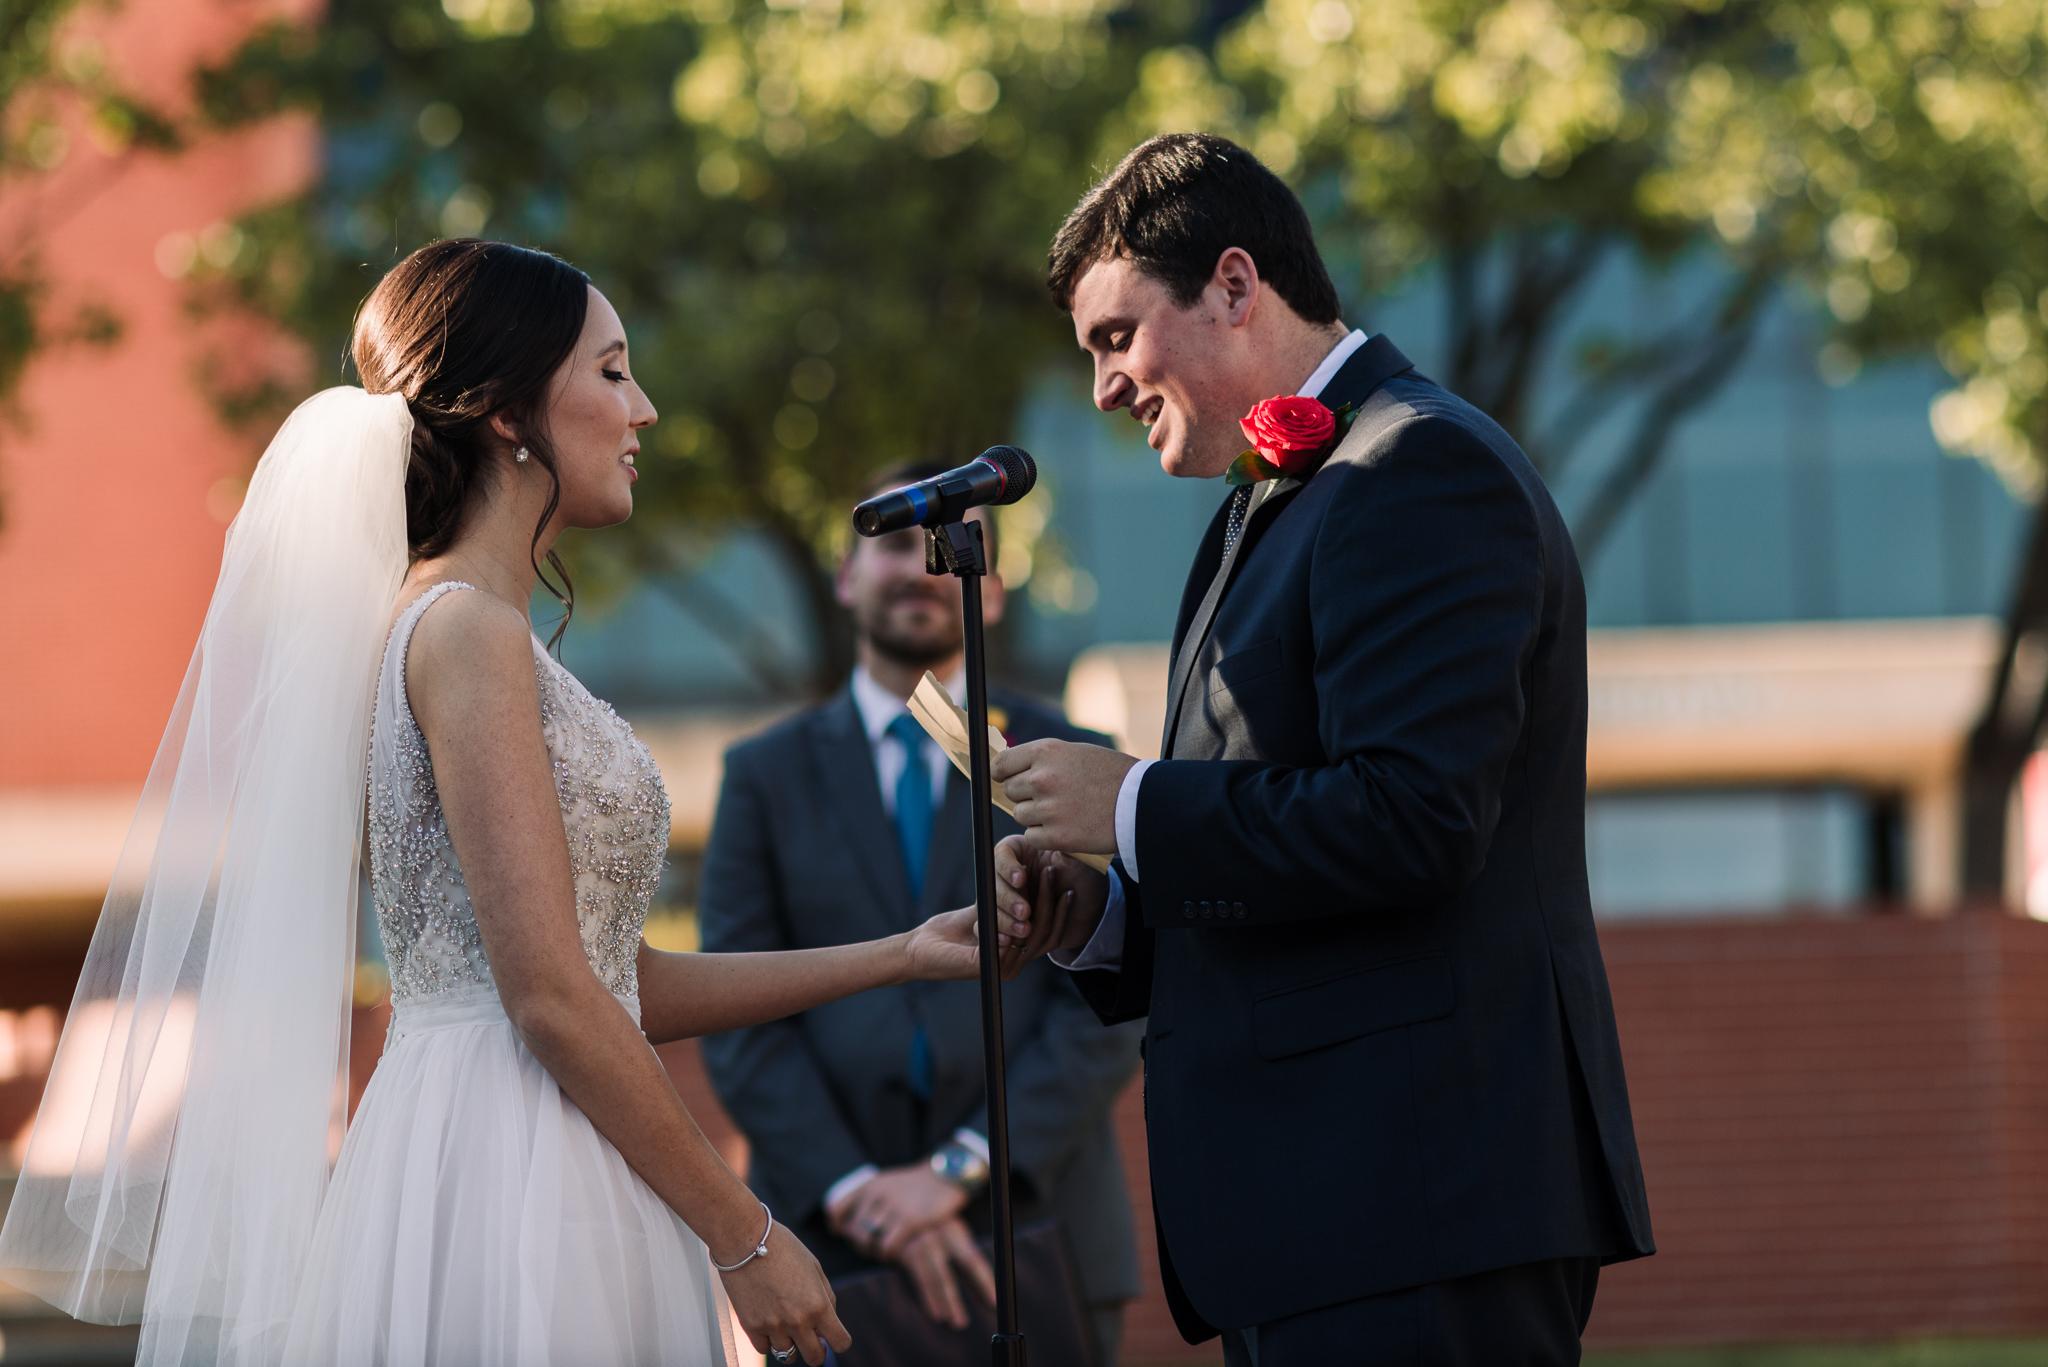 Oklahoma-Christian-University-Wedding-0412.jpg